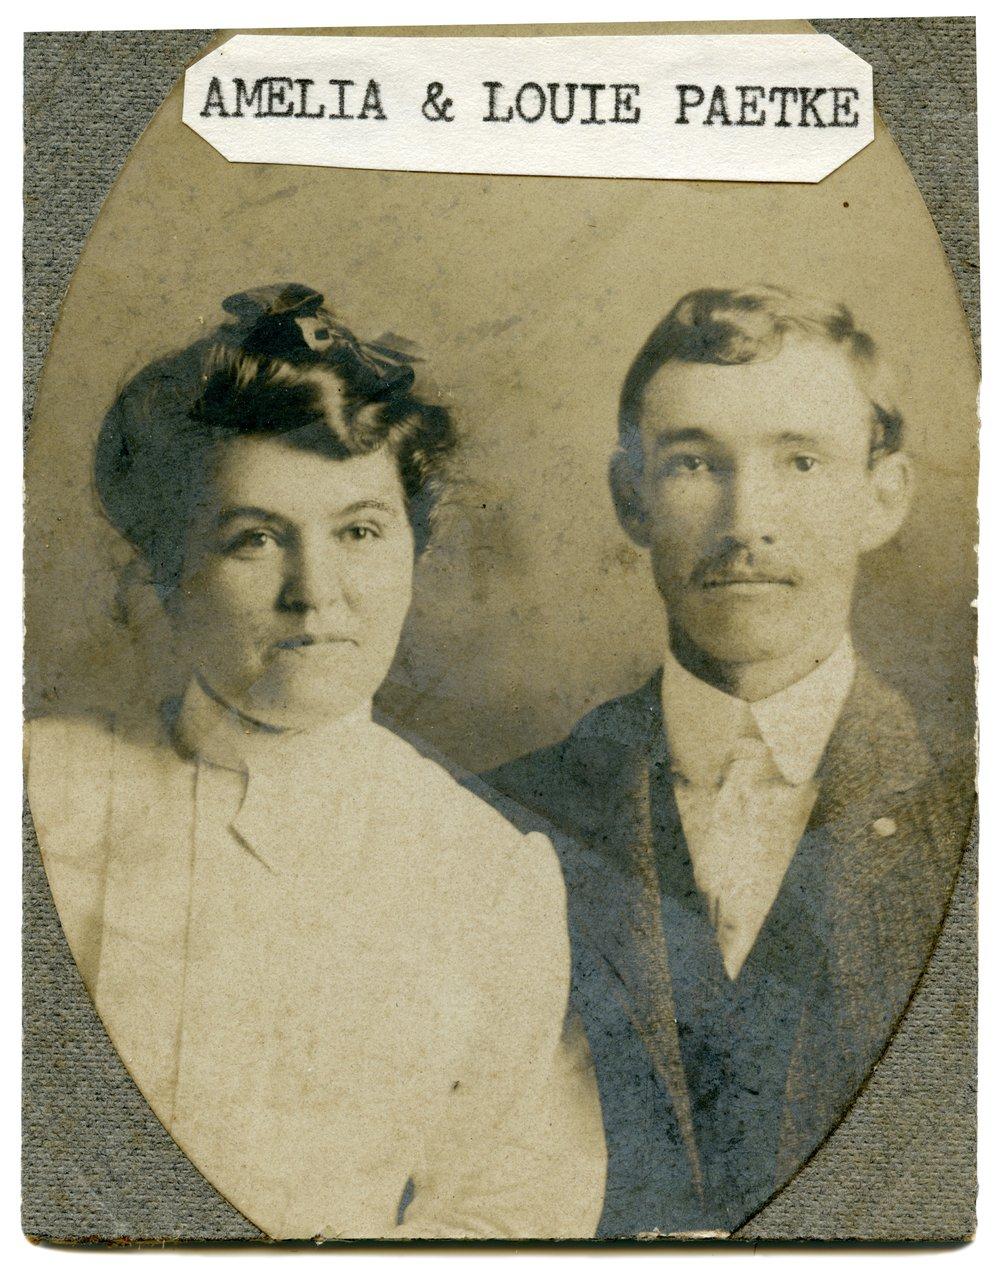 Amelia and Louis Paetke